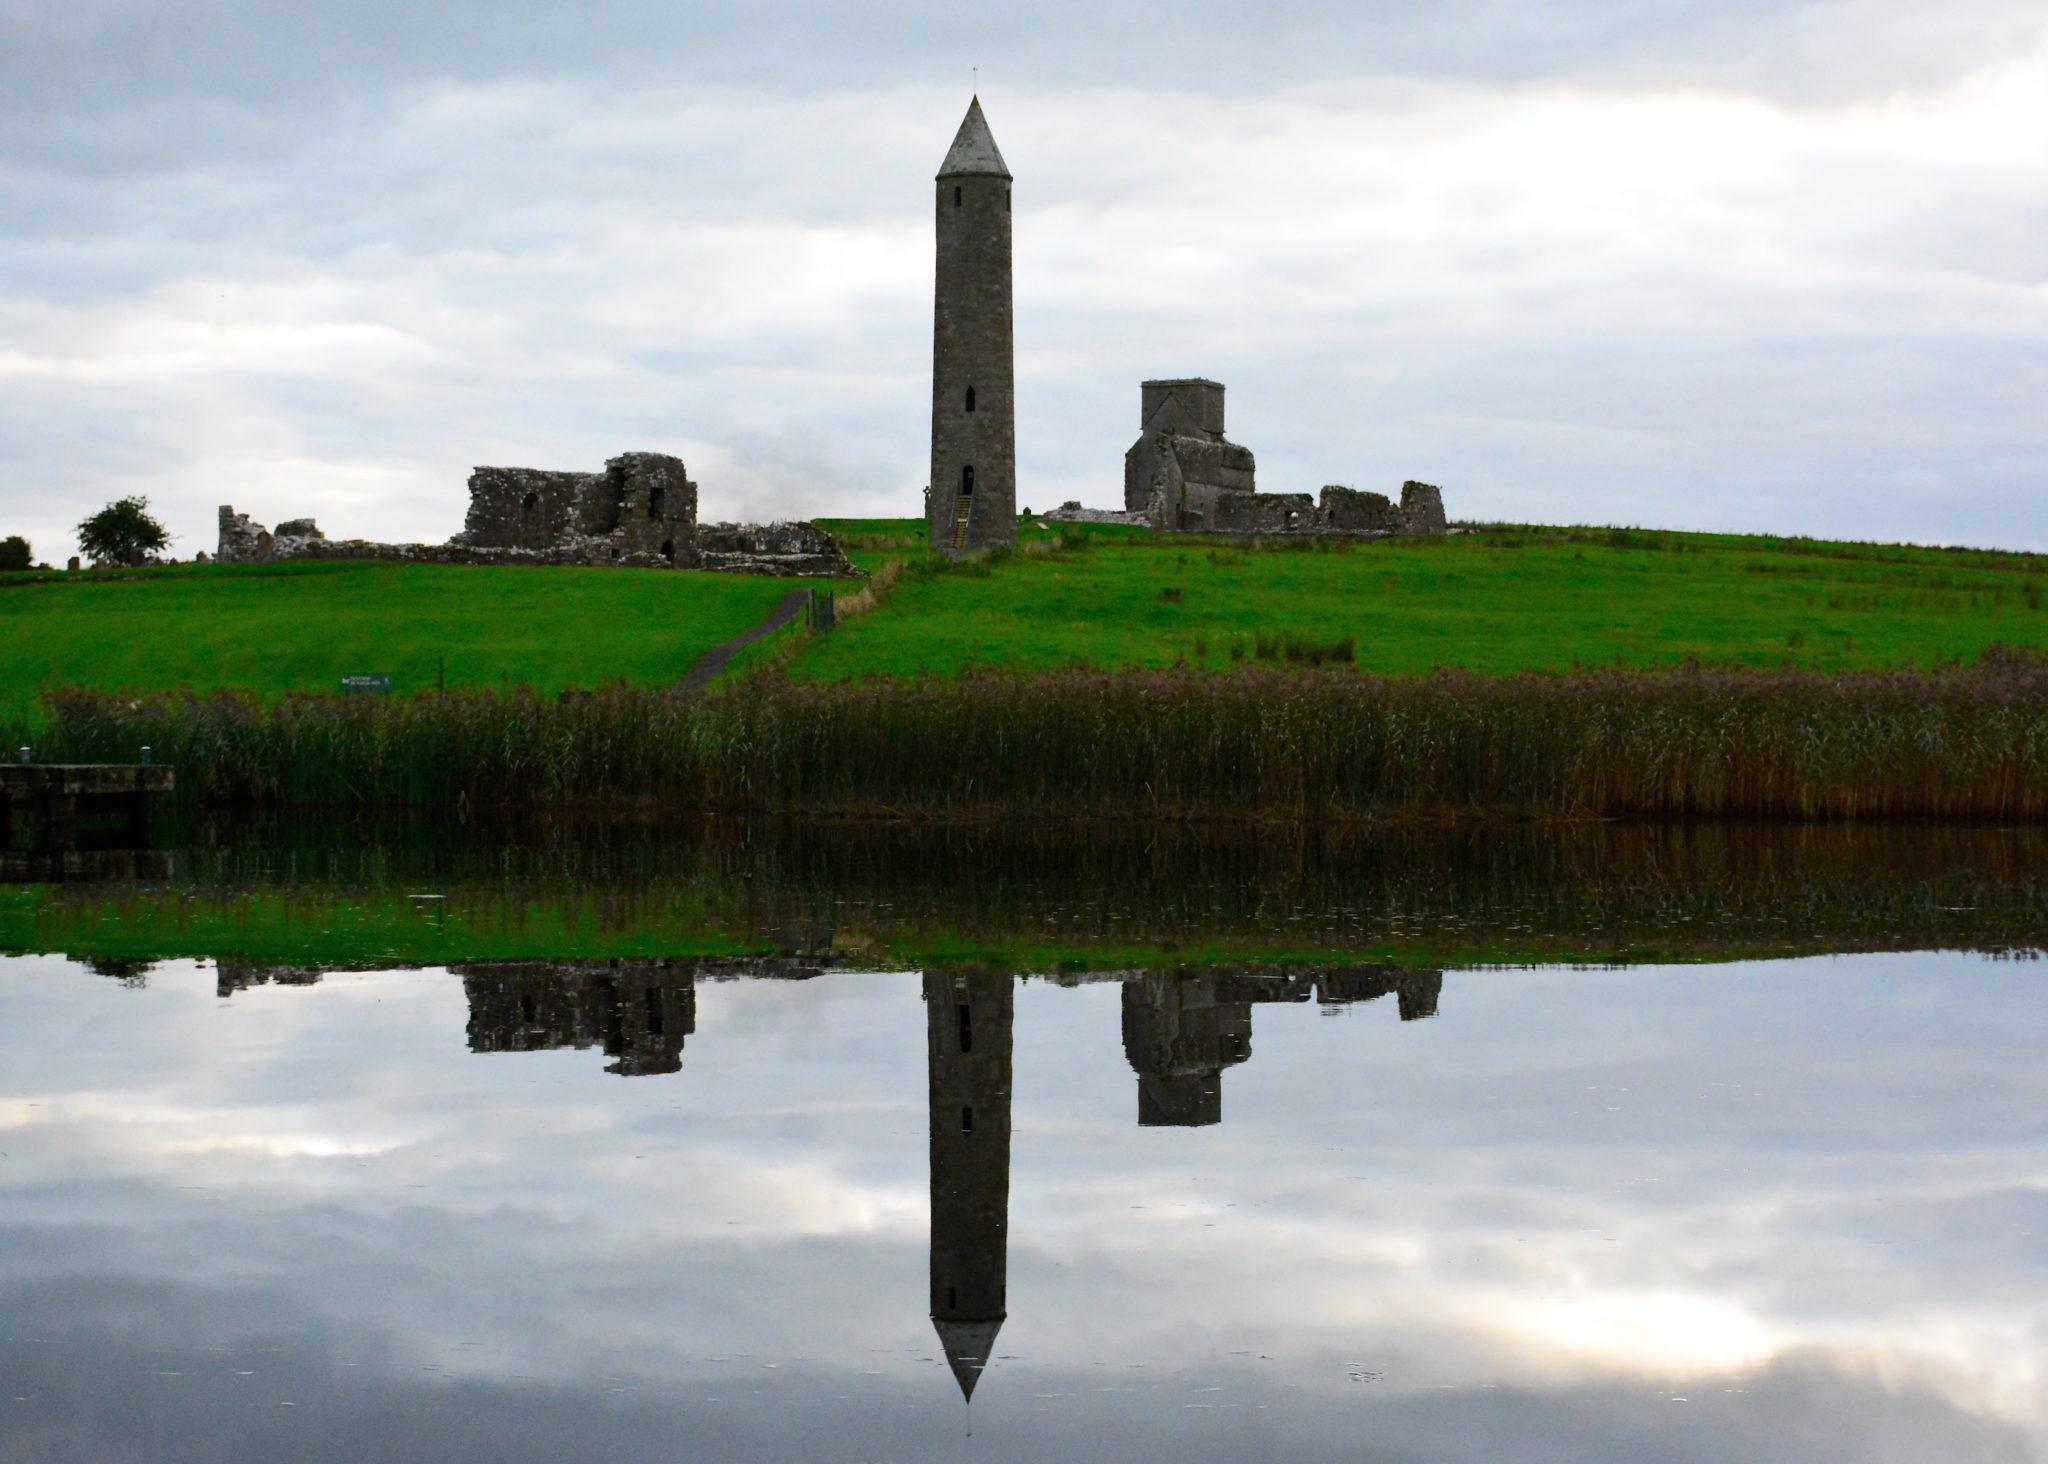 a-lovely-planet-devenish-island-monastic-site